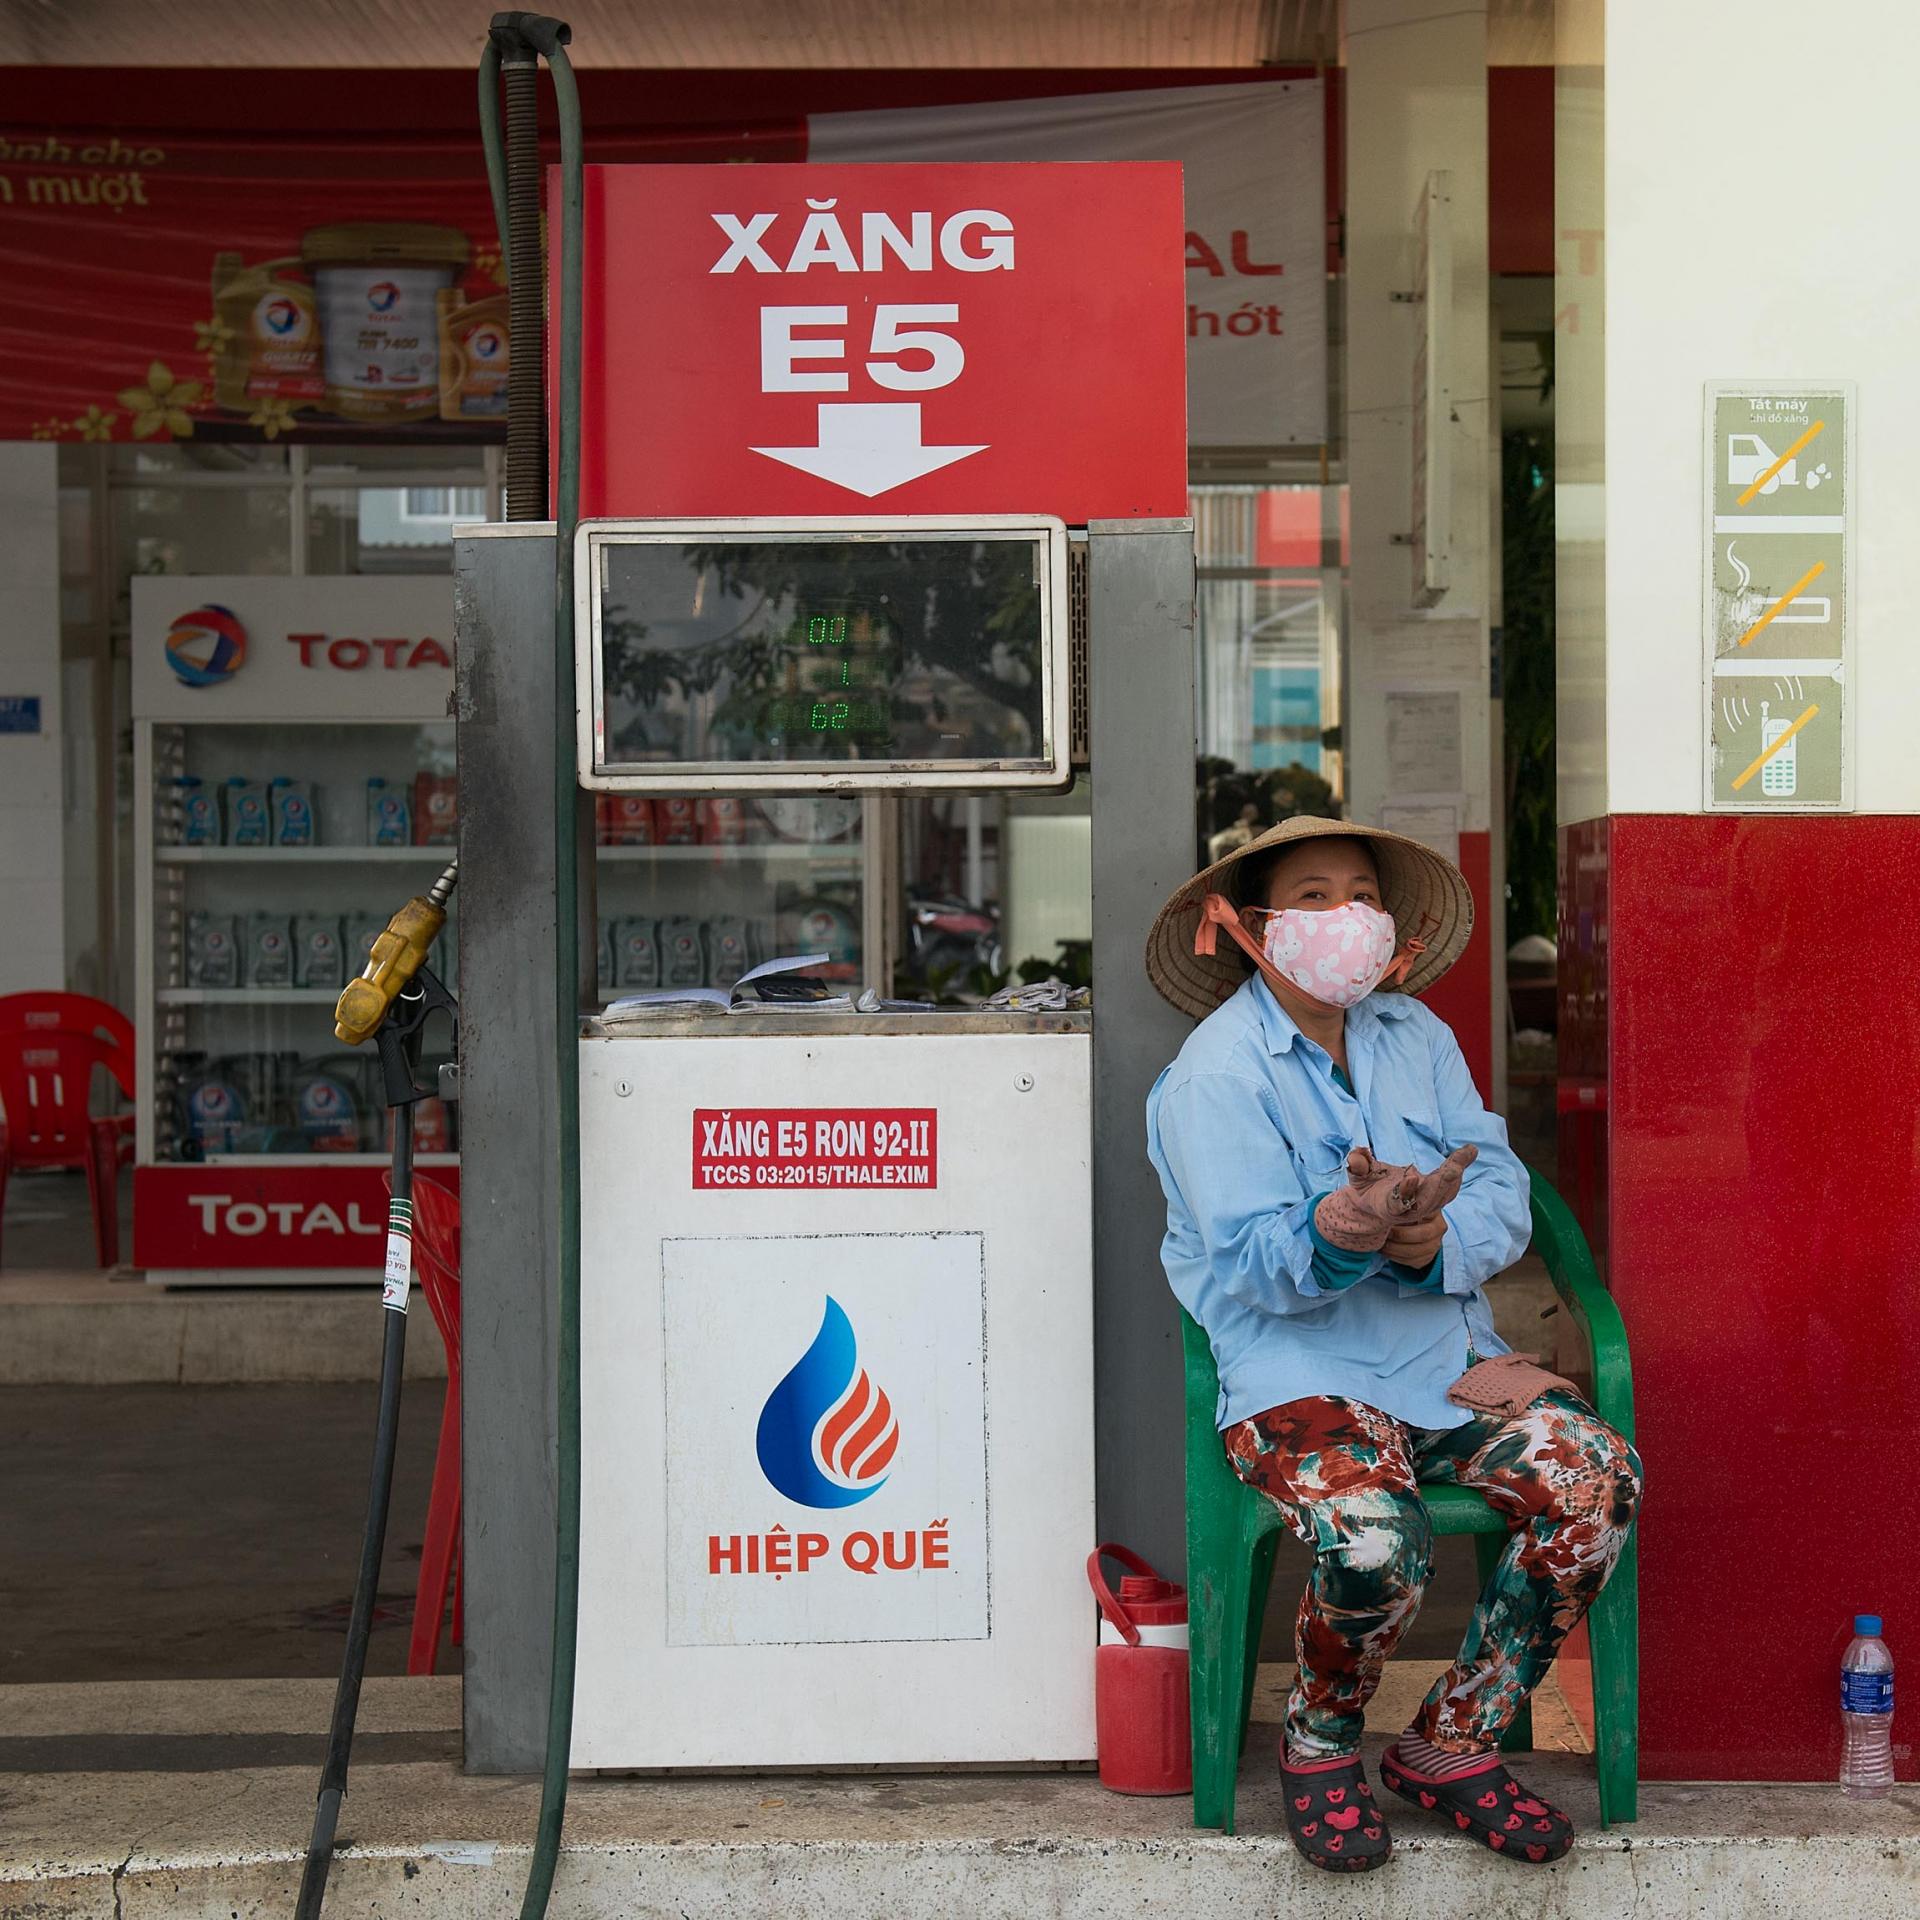 5444 gas station